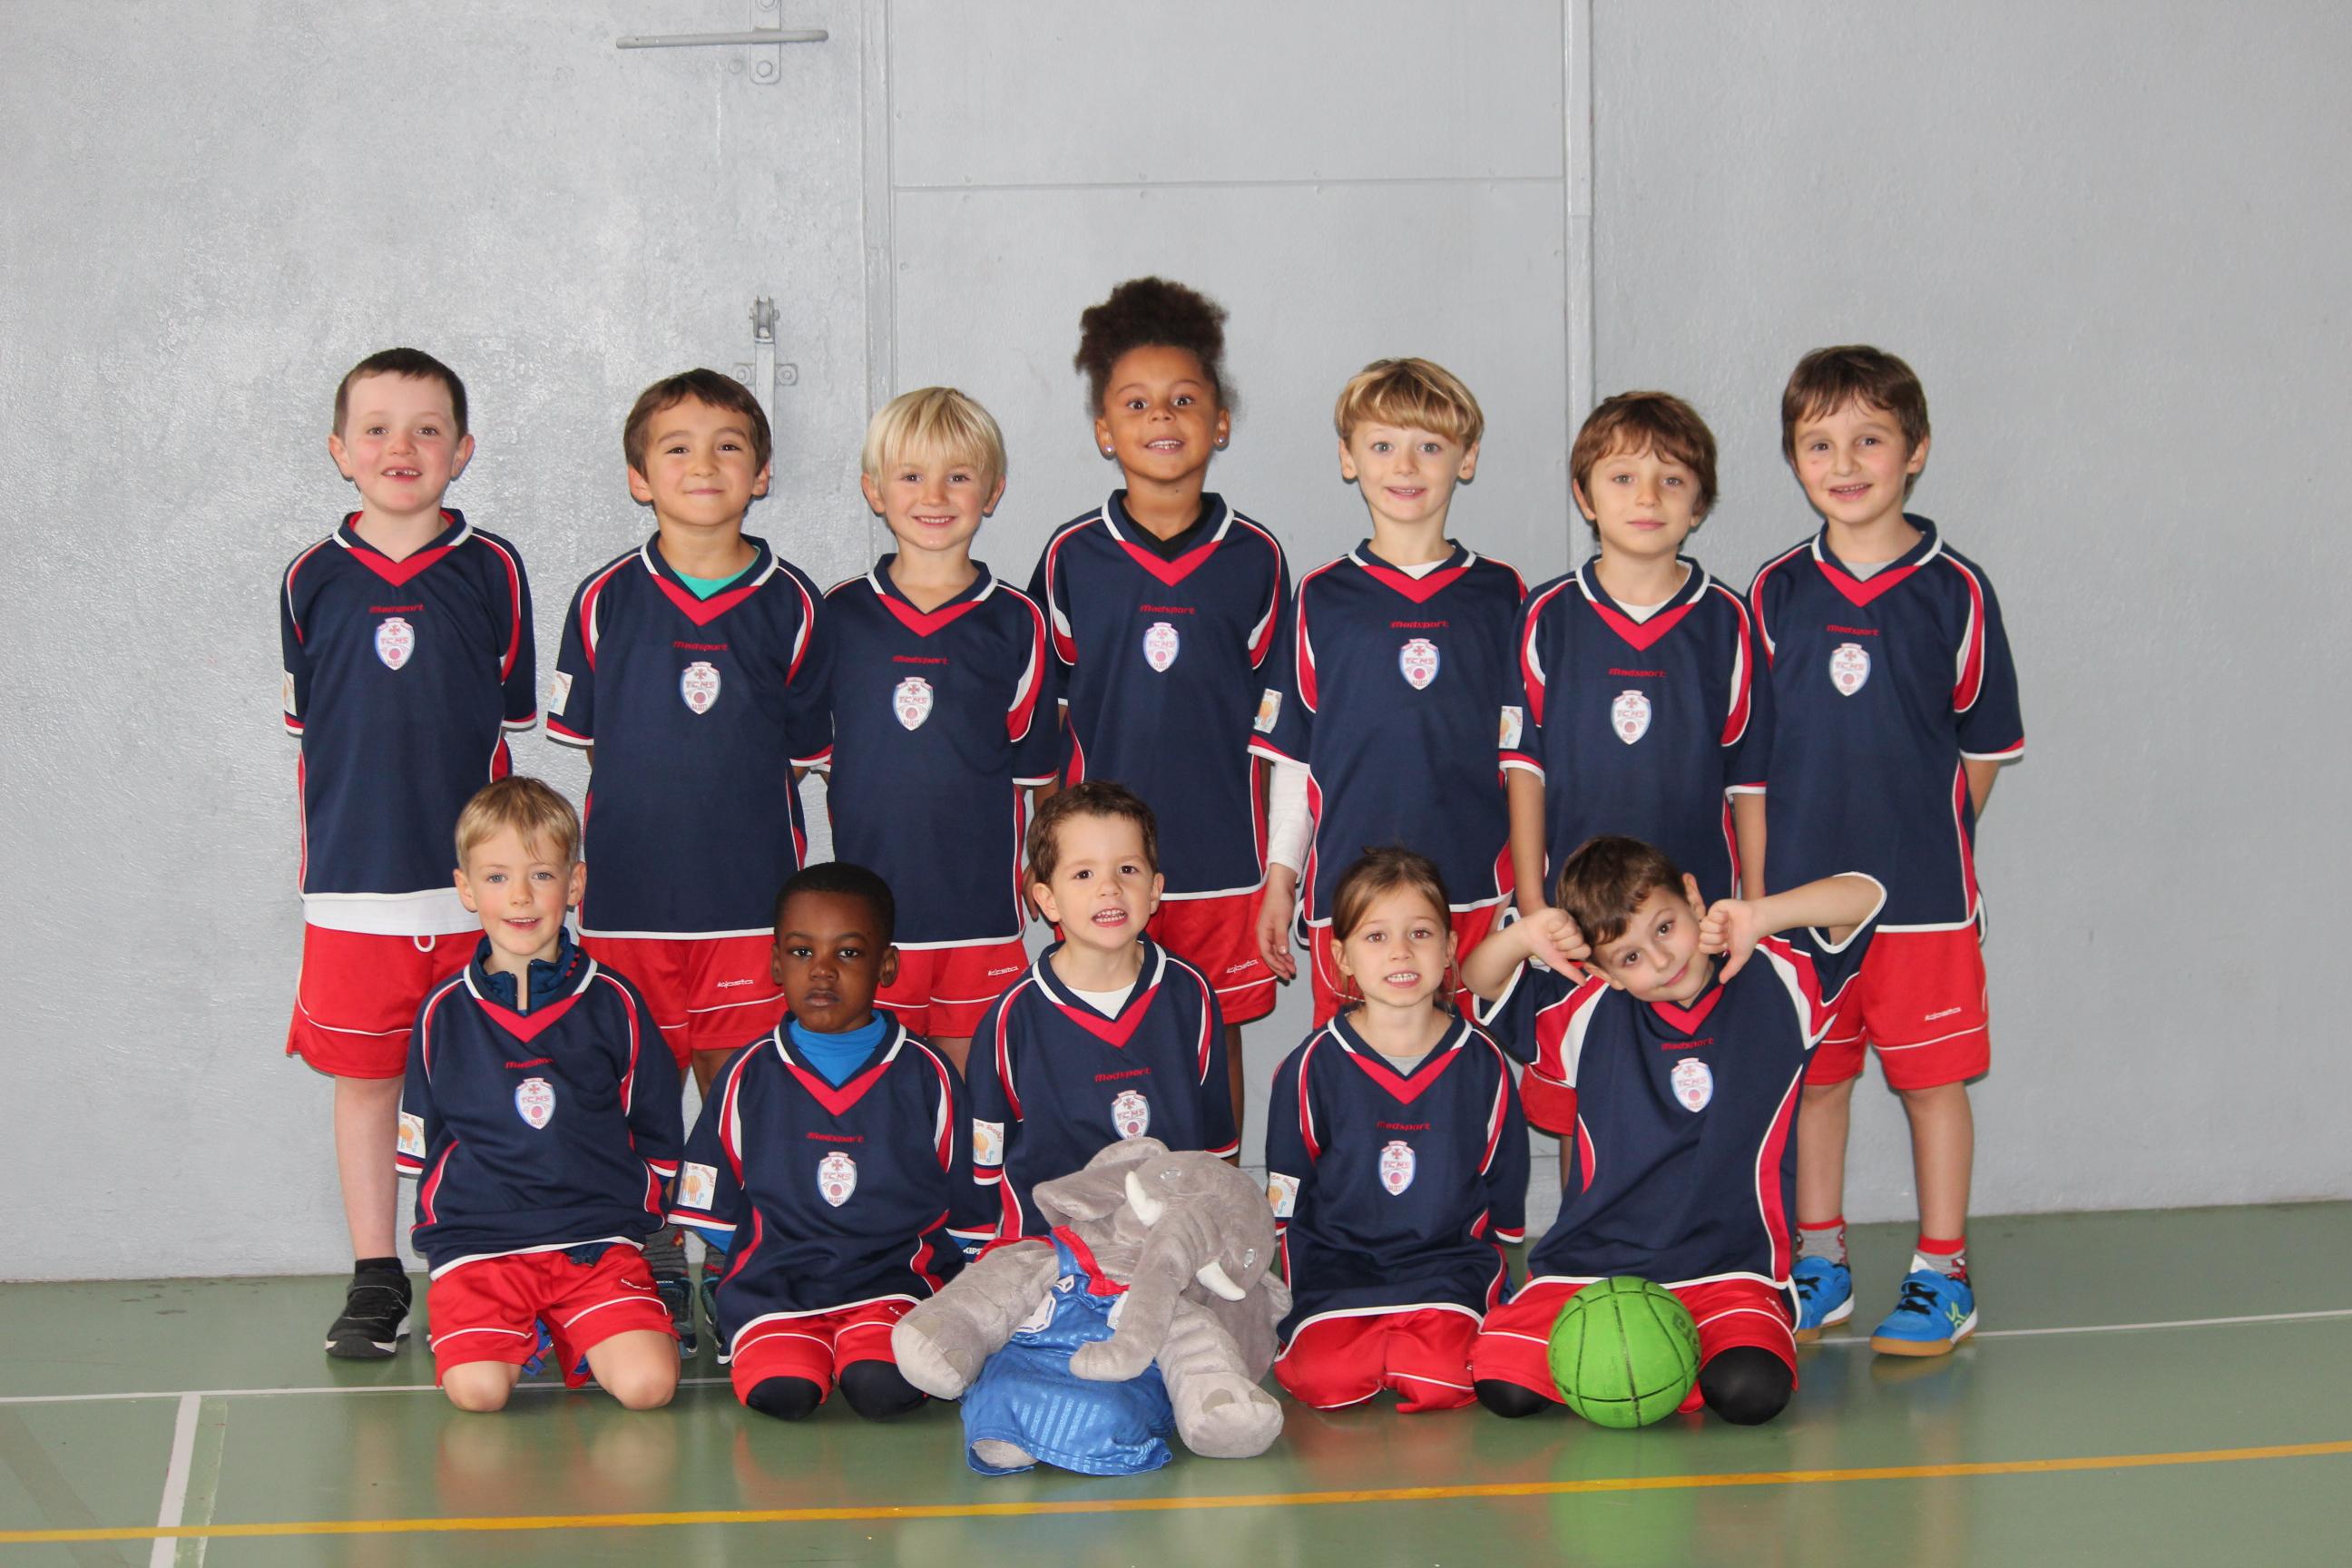 Photo Équipe U7 / Saison 2018-2019